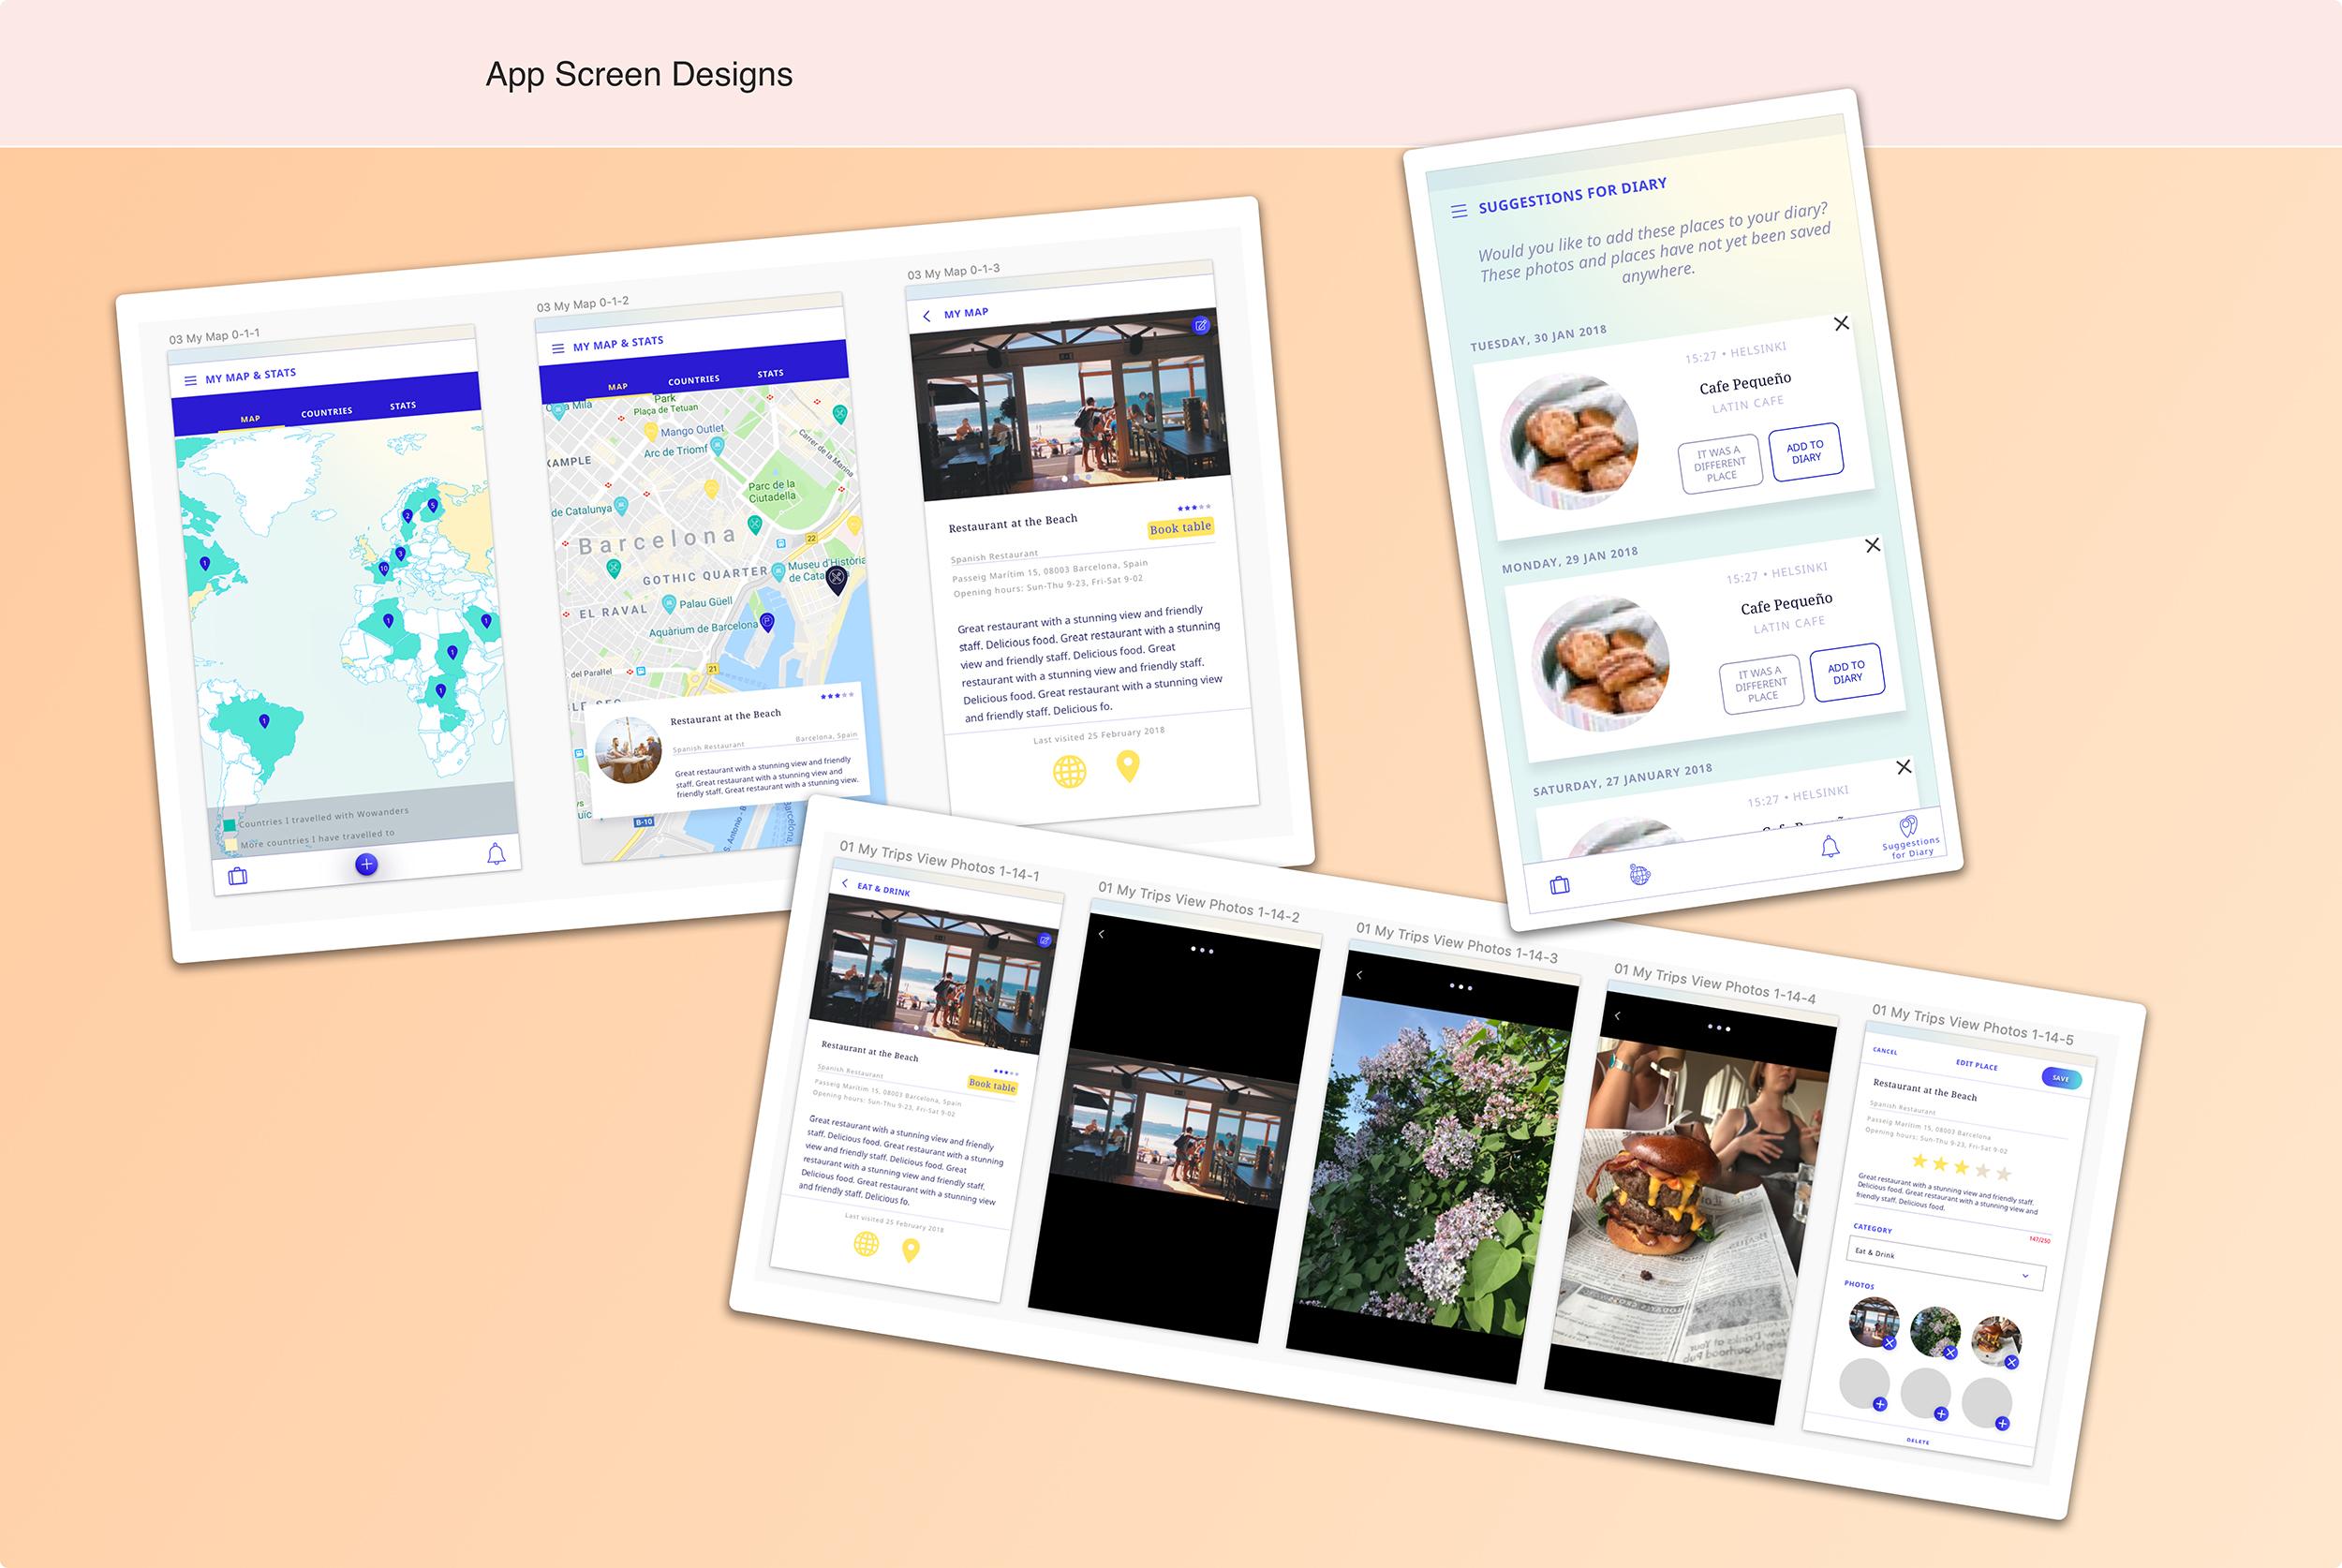 App_Design_Sketch_Screens.jpg